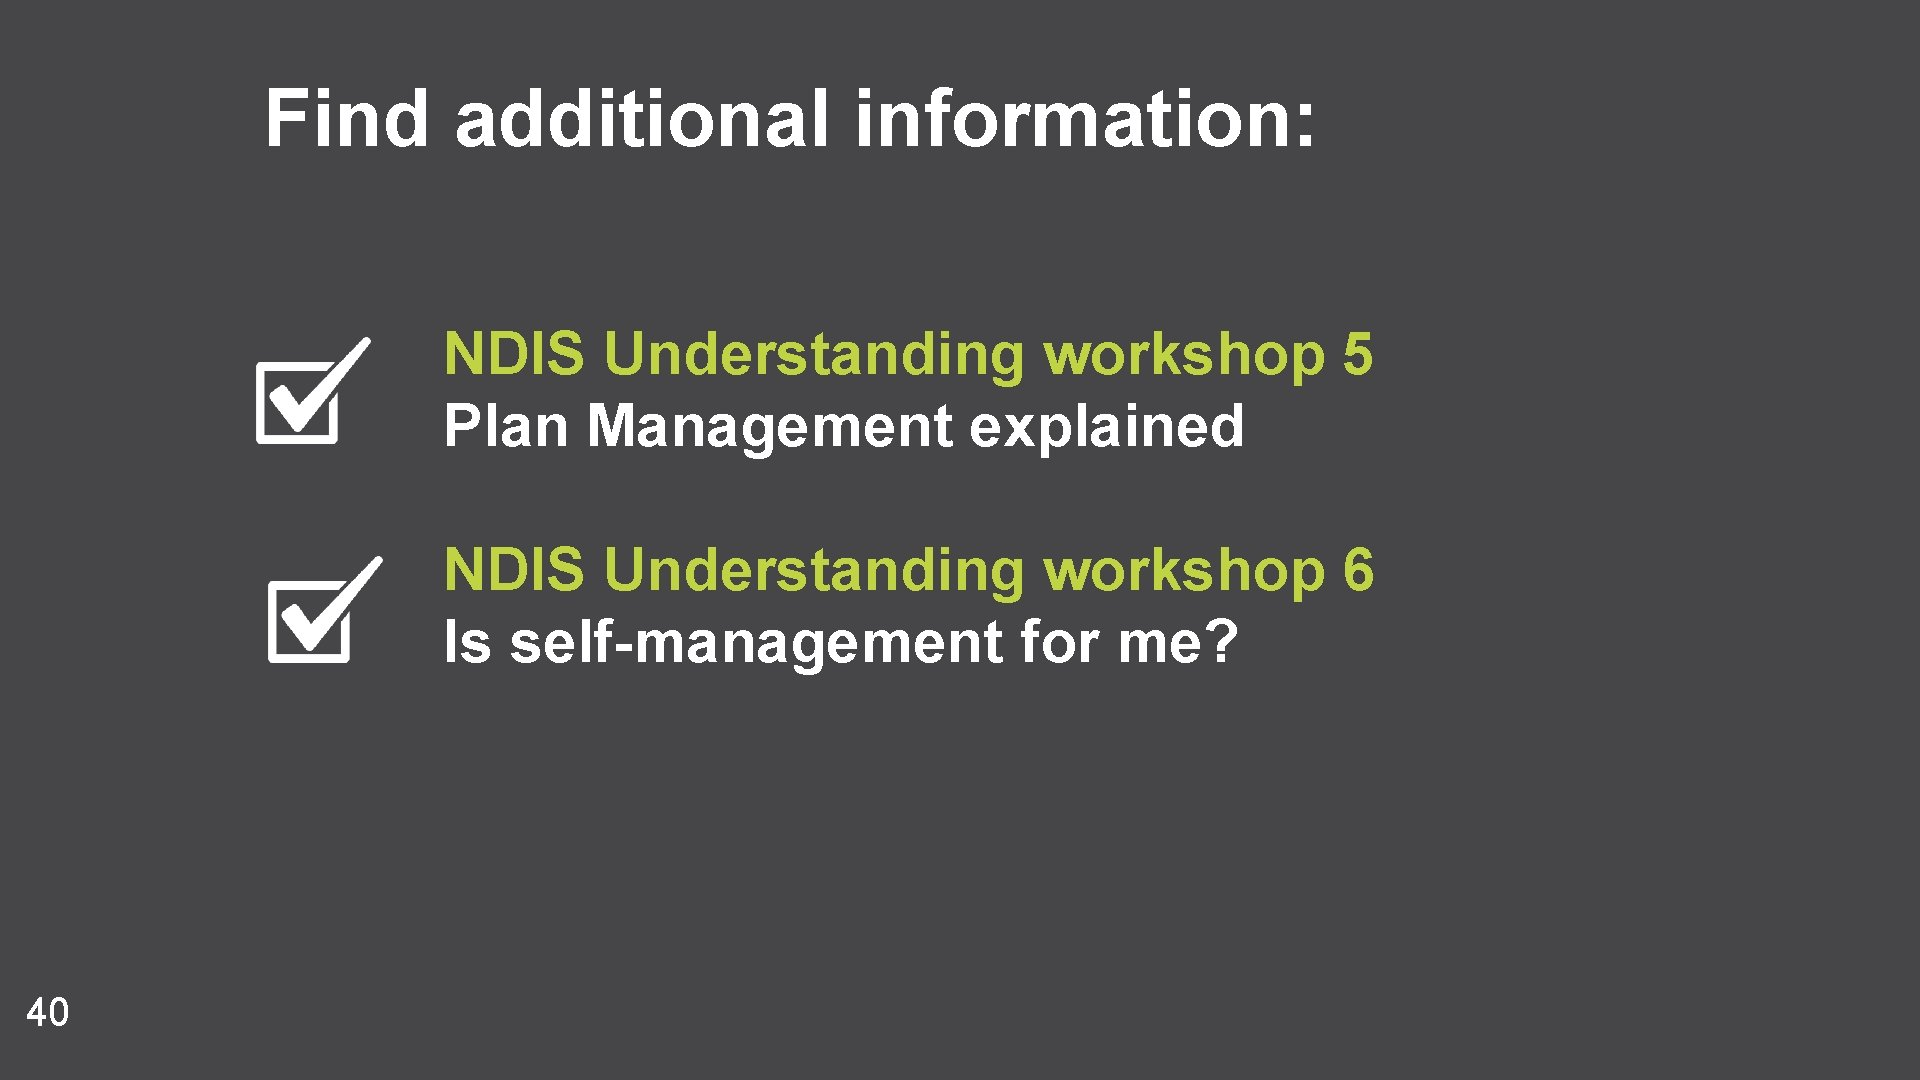 Find additional information: NDIS Understanding workshop 5 Plan Management explained NDIS Understanding workshop 6